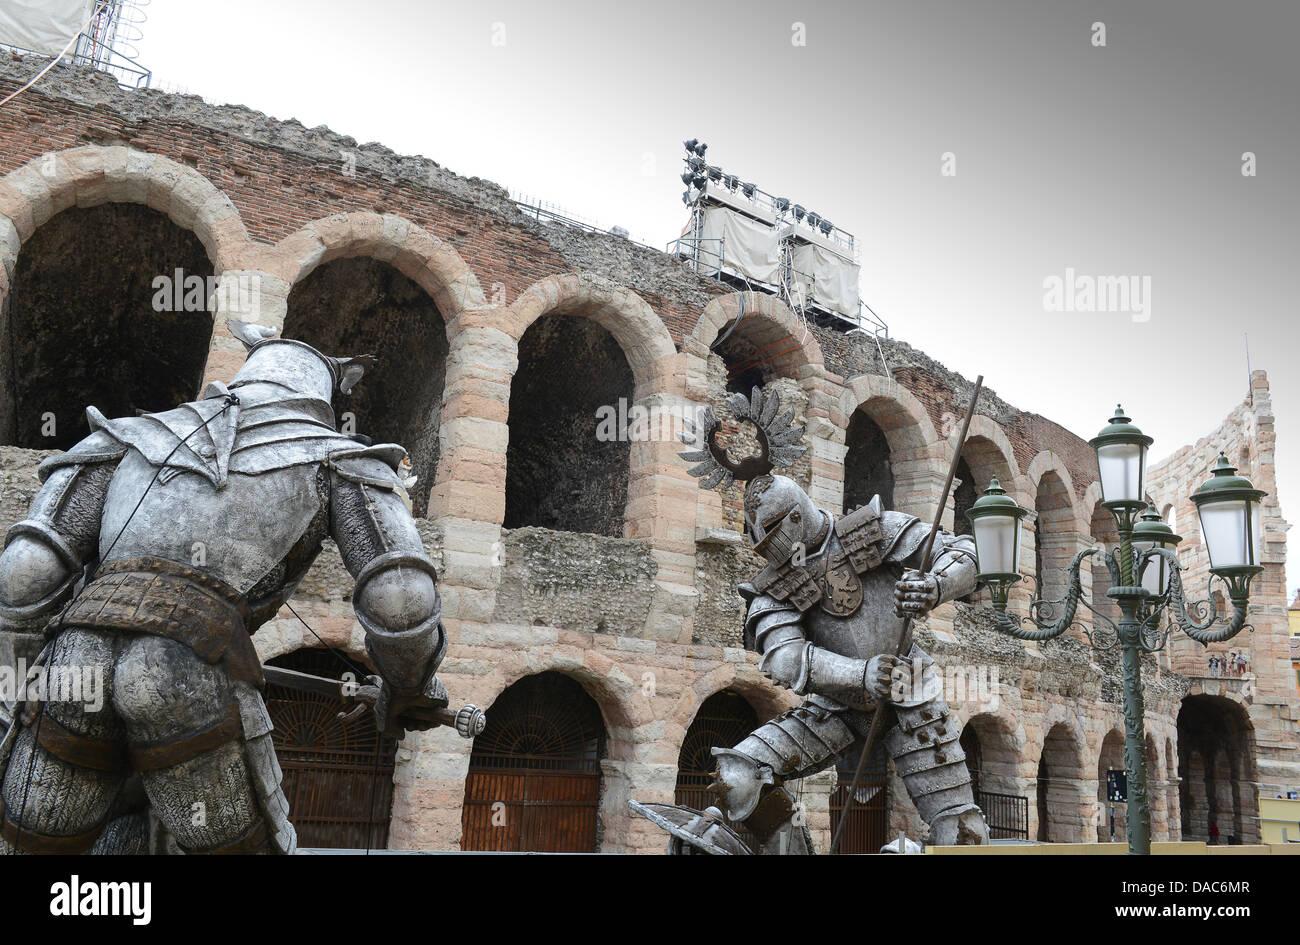 Verona Italy props for the 2013 opera season outside the Arena di Verona - Stock Image